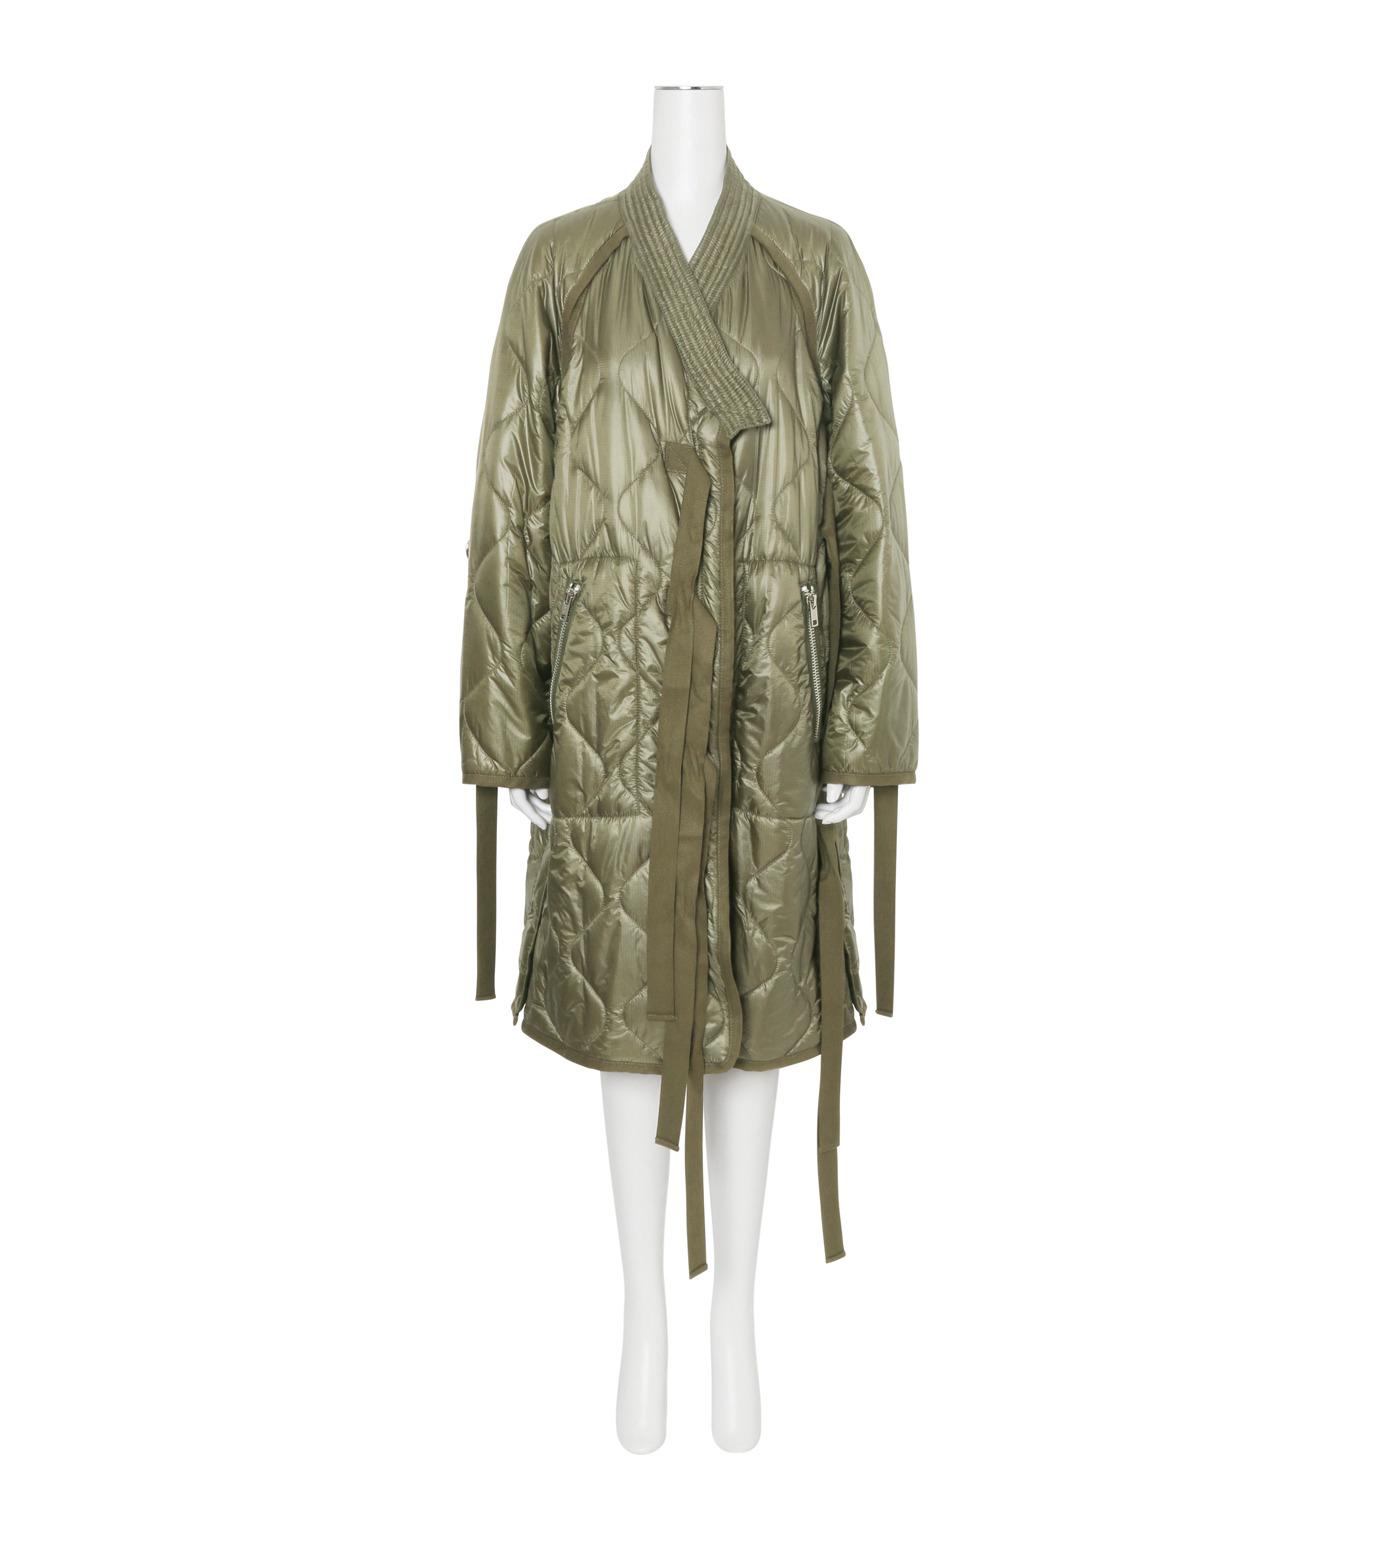 3.1 Phillip Lim(スリーワン フィリップリム)のLong Utility Kimono Jacket-KHAKI(コート/coat)-F161-8326RSN-24 拡大詳細画像1